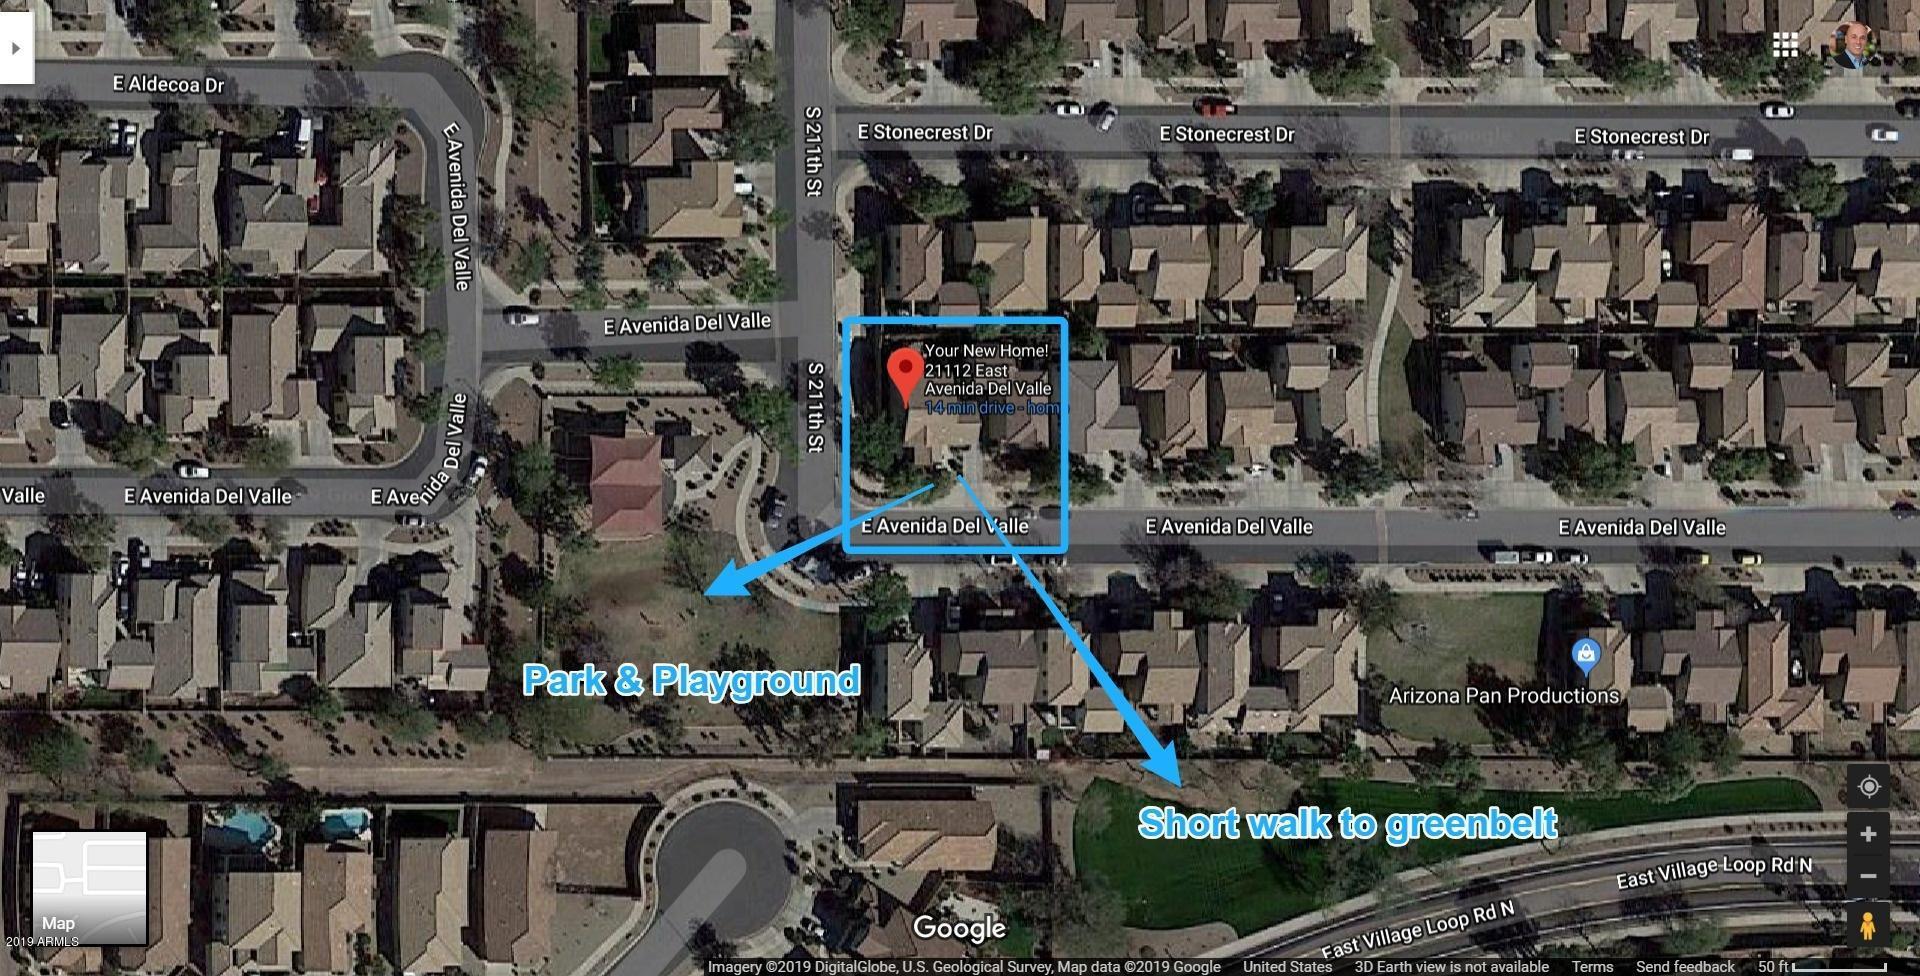 Map Of Arizona Cities Queen Creek.21112 E Avenida Del Valle Queen Creek 85142 Sold Listing Mls 5896035 Better Homes And Gardens Bloomtree Realty